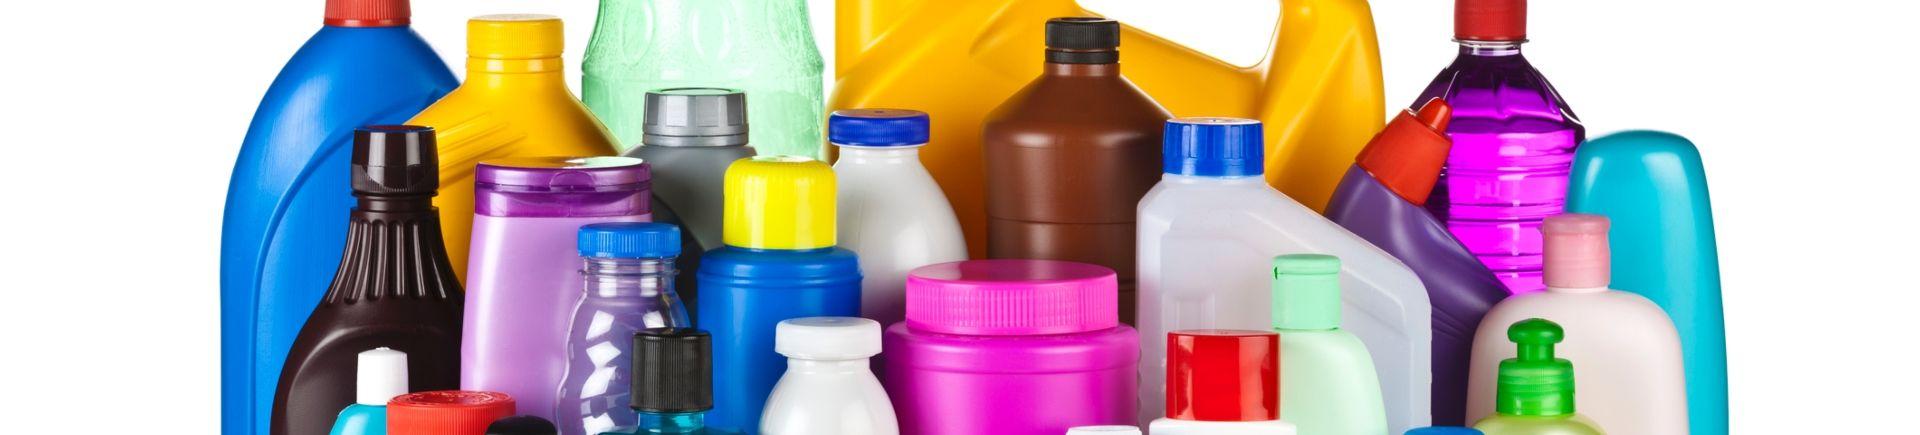 smarter plastic packaging